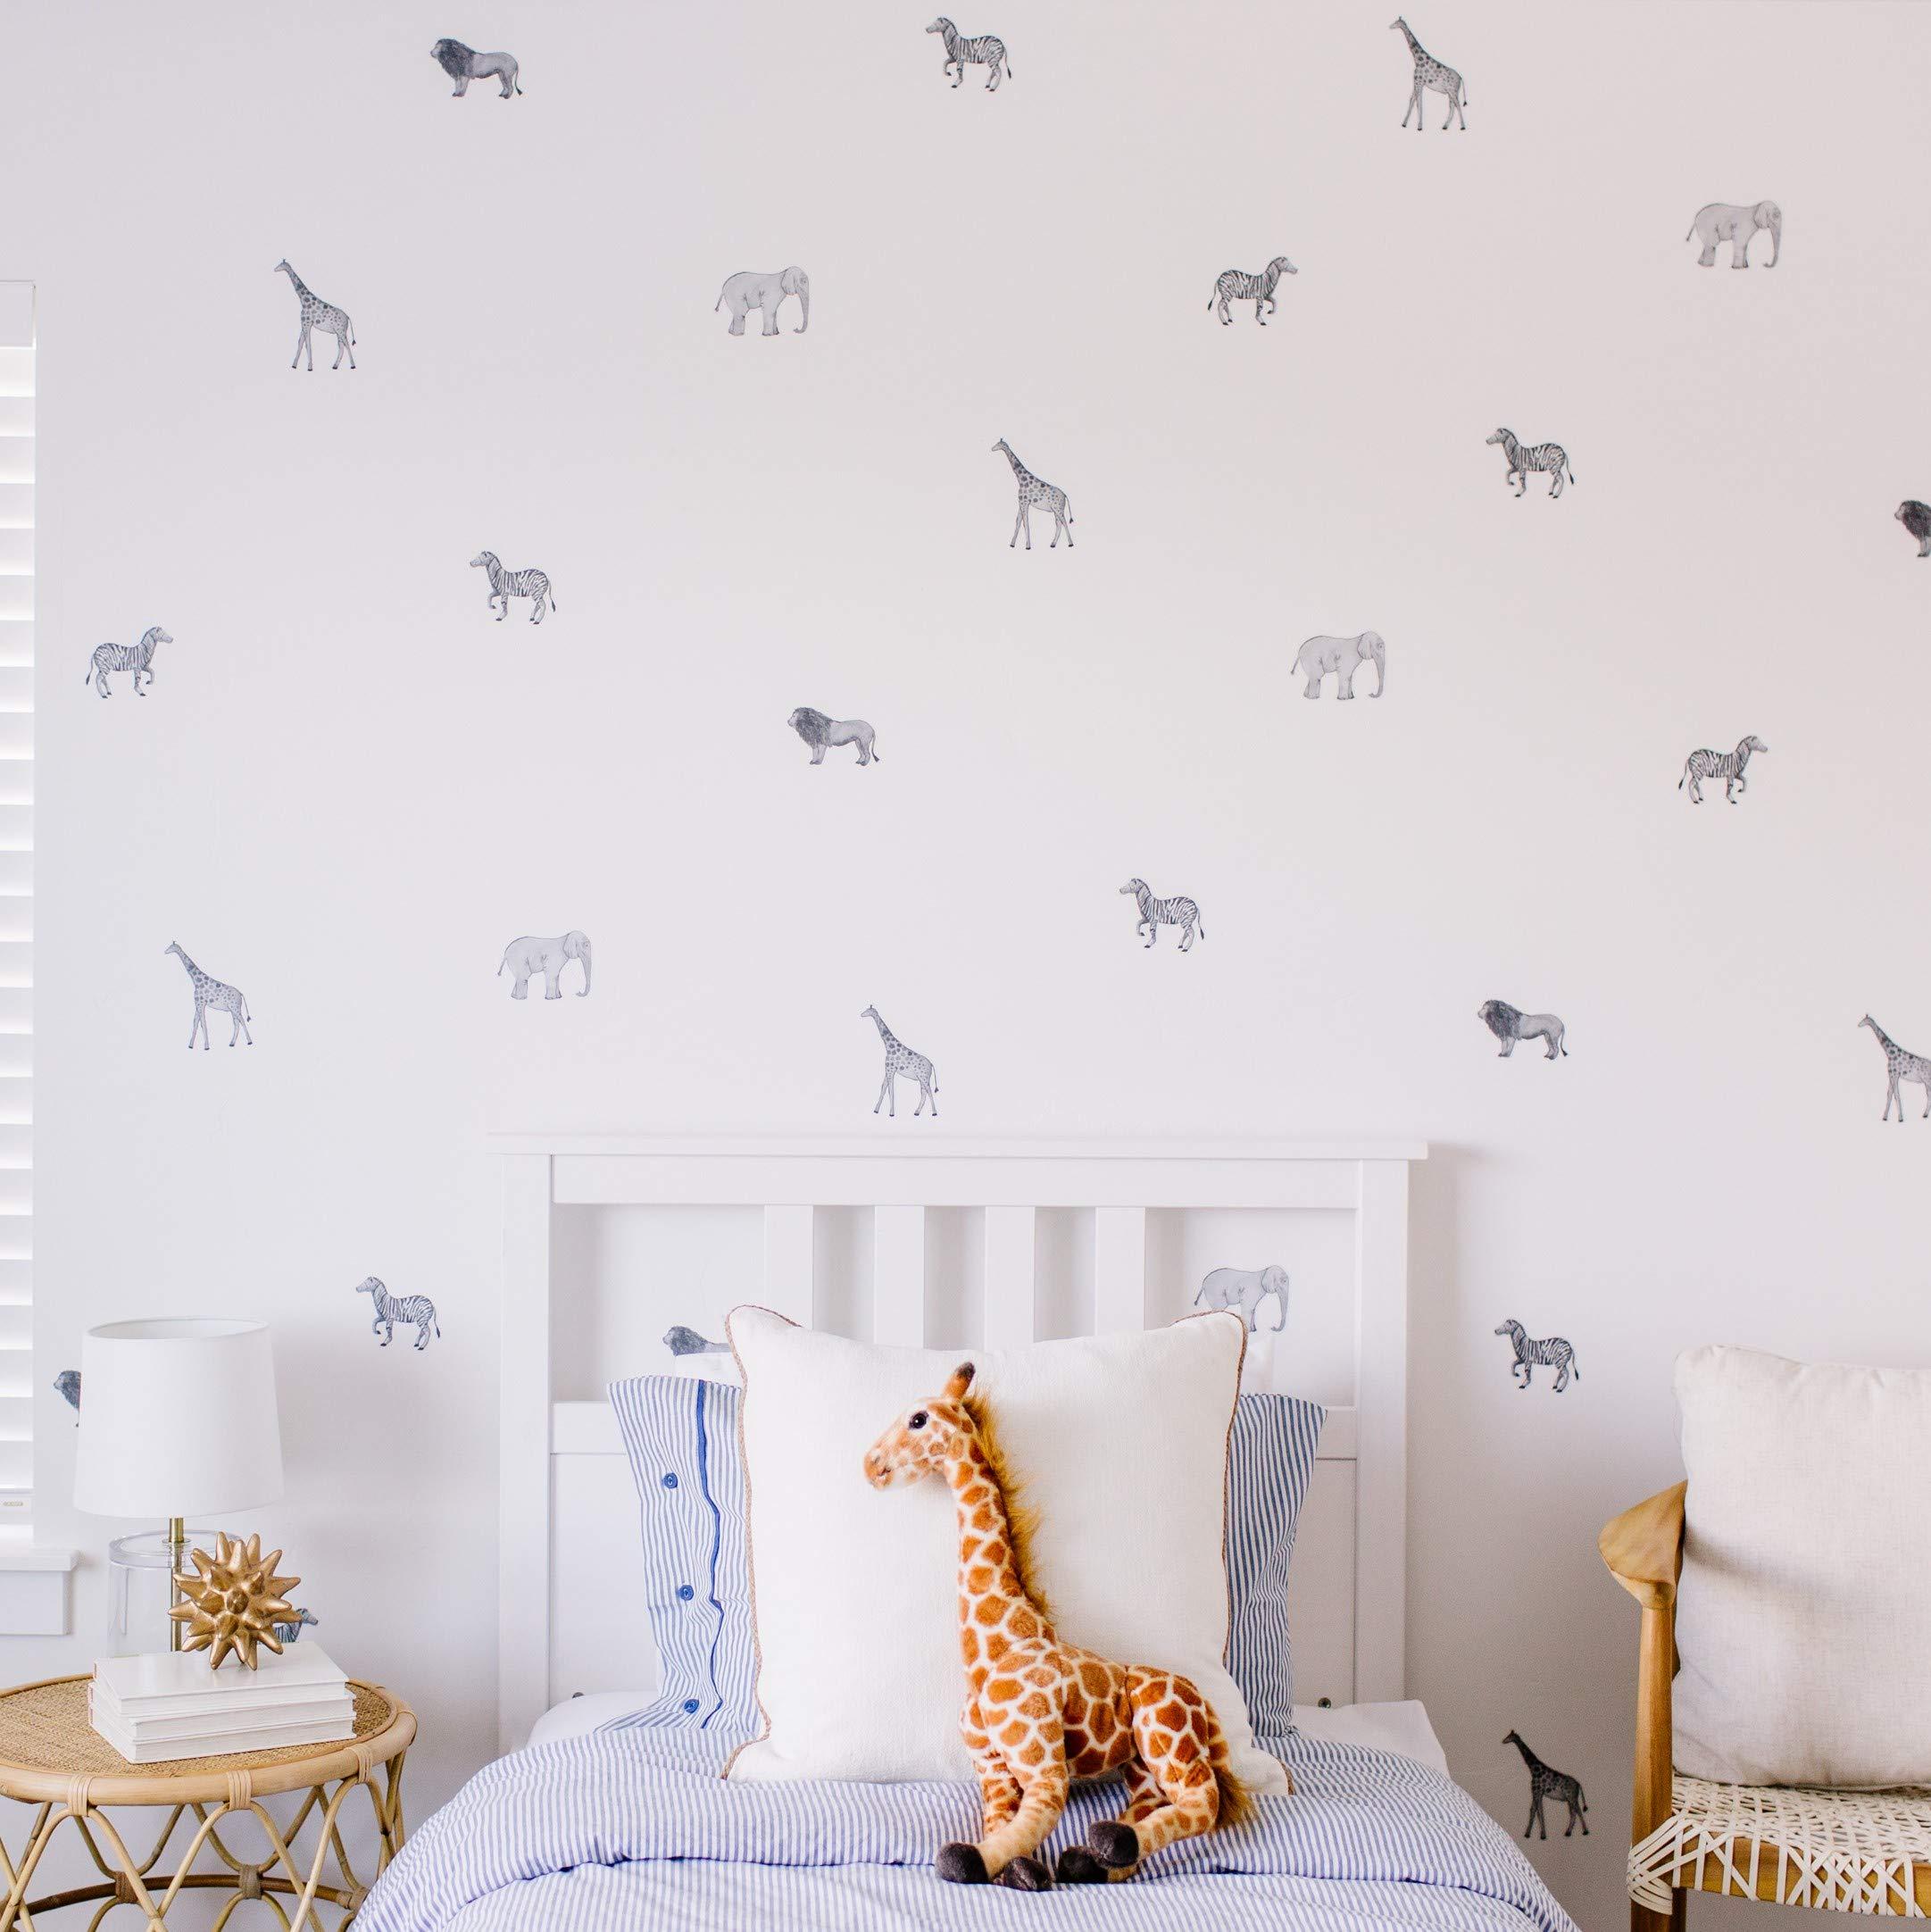 Modern Maxwell Wall Art Decals for Boys Girls Nursery, Bedroom, Living Room ''Safari'' Black Jungle Animals Room Sticker 40 Pieces by Modern Maxwell